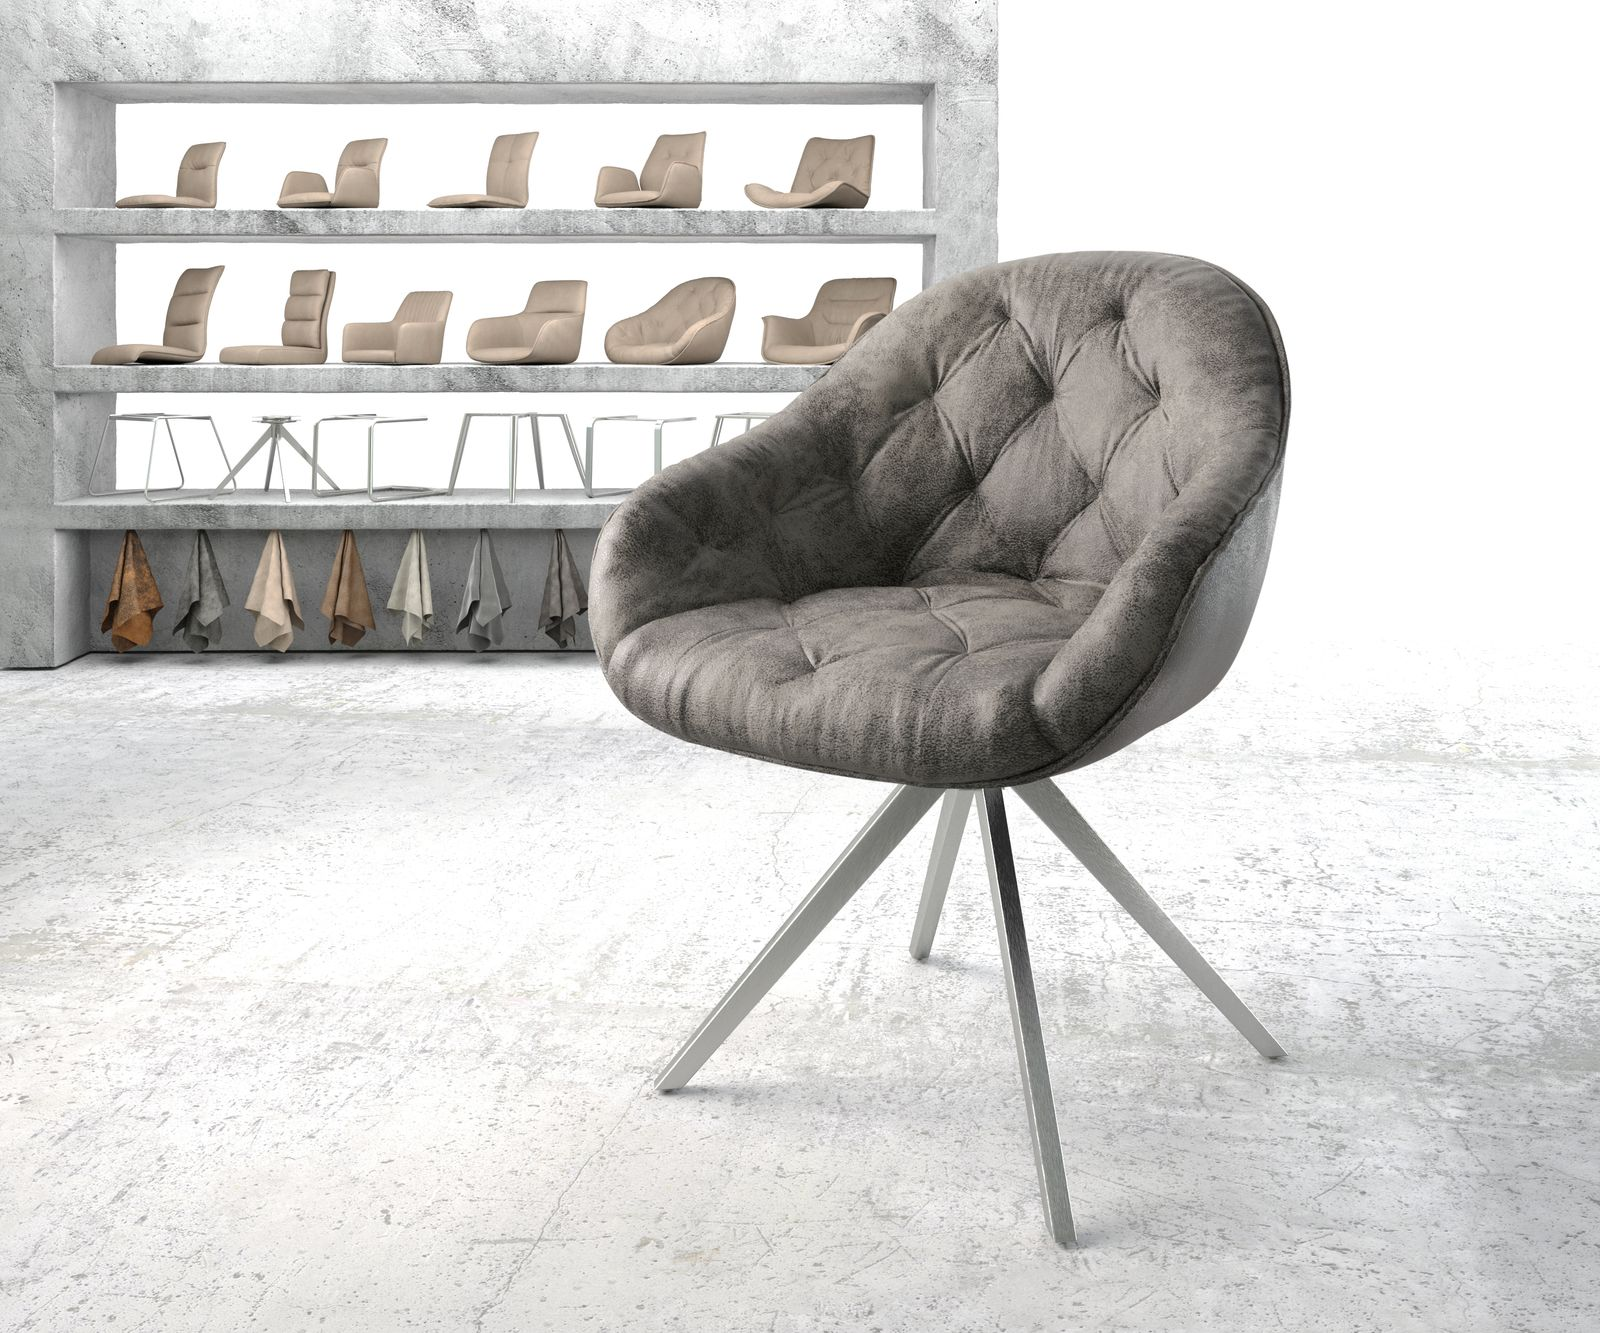 delife-armlehnstuhl-gaio-flex-grau-vintage-kreuzgestell-drehbar-edelstahl-esszimmerstuhle